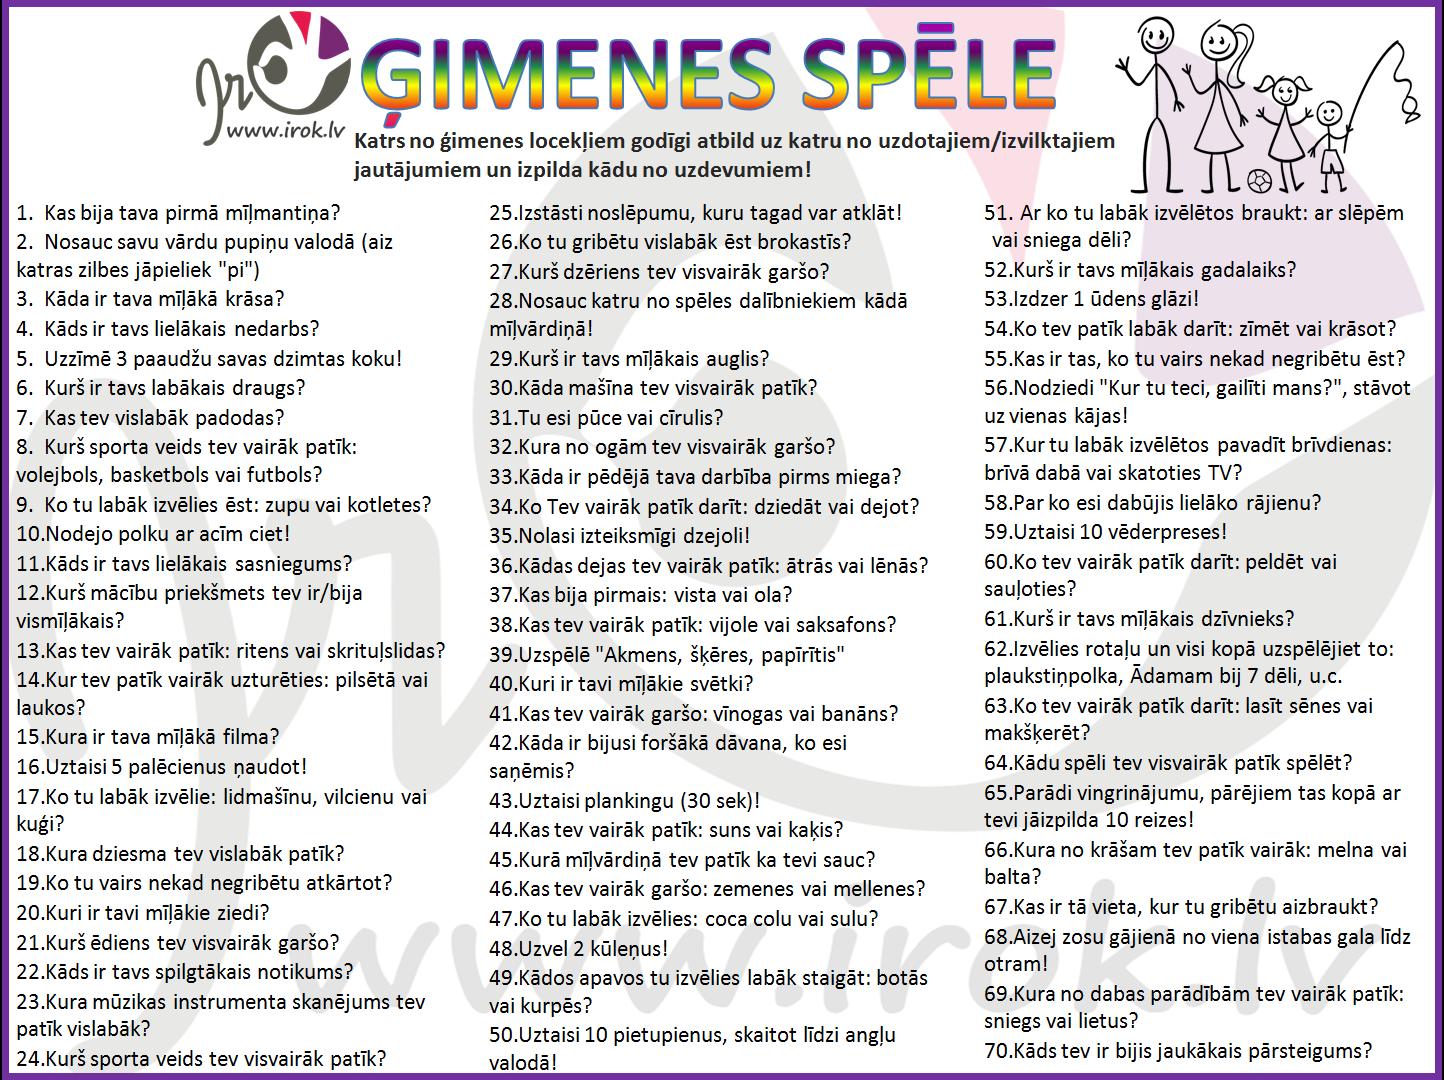 gimenes_spele_www.irok.lv